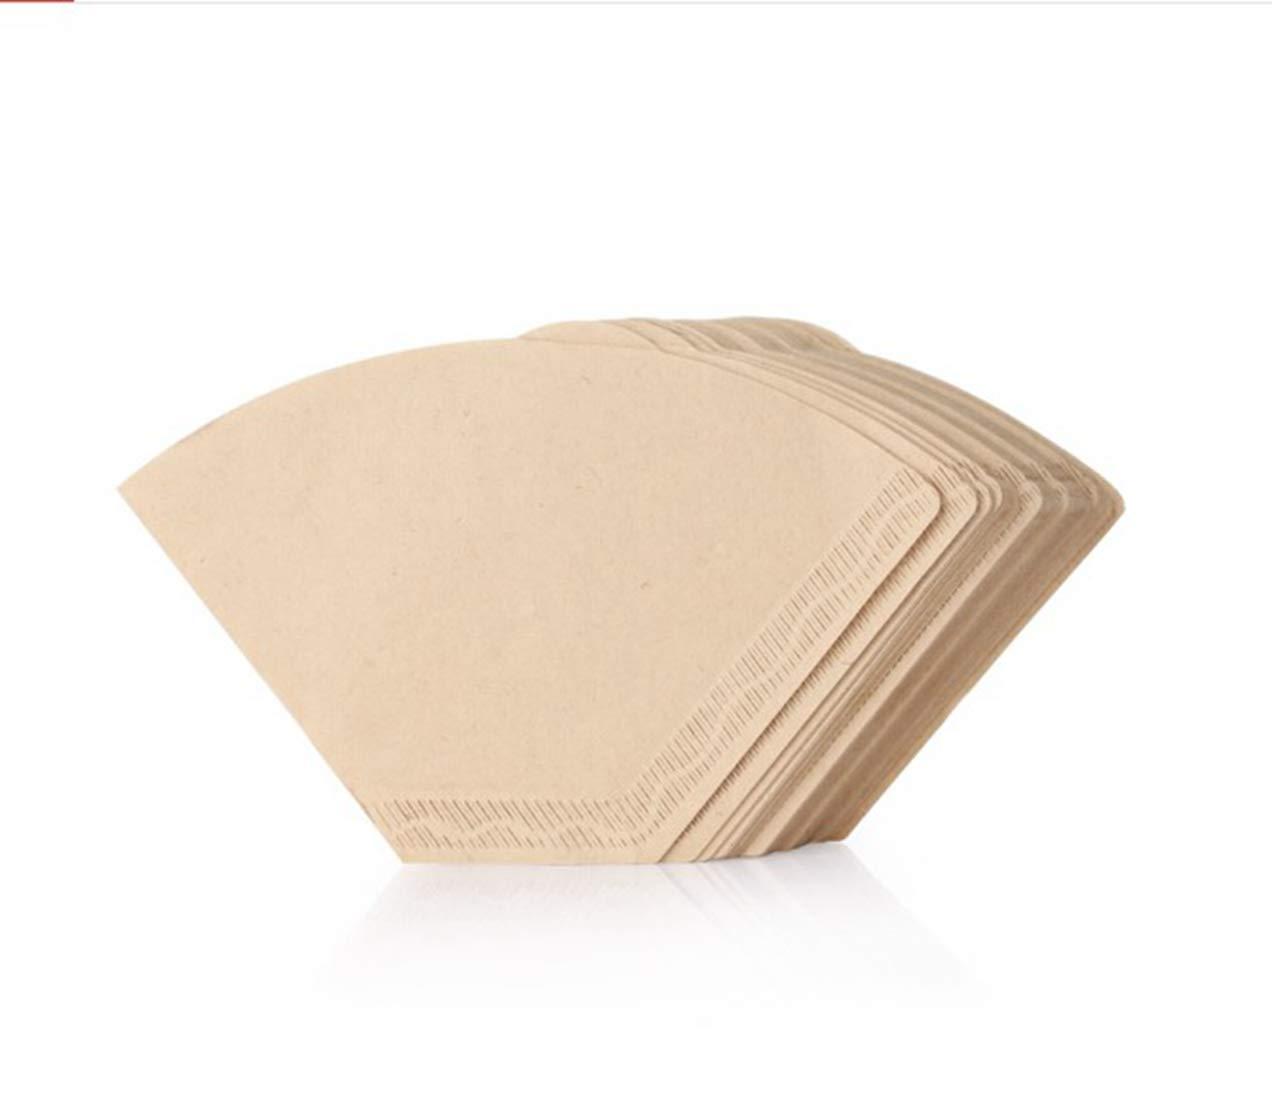 WEATLY Kaffeefilterpapier Primärfarbe 100 Teile/Beutel Tropfpfanne 102 (Color : Aprikosen)